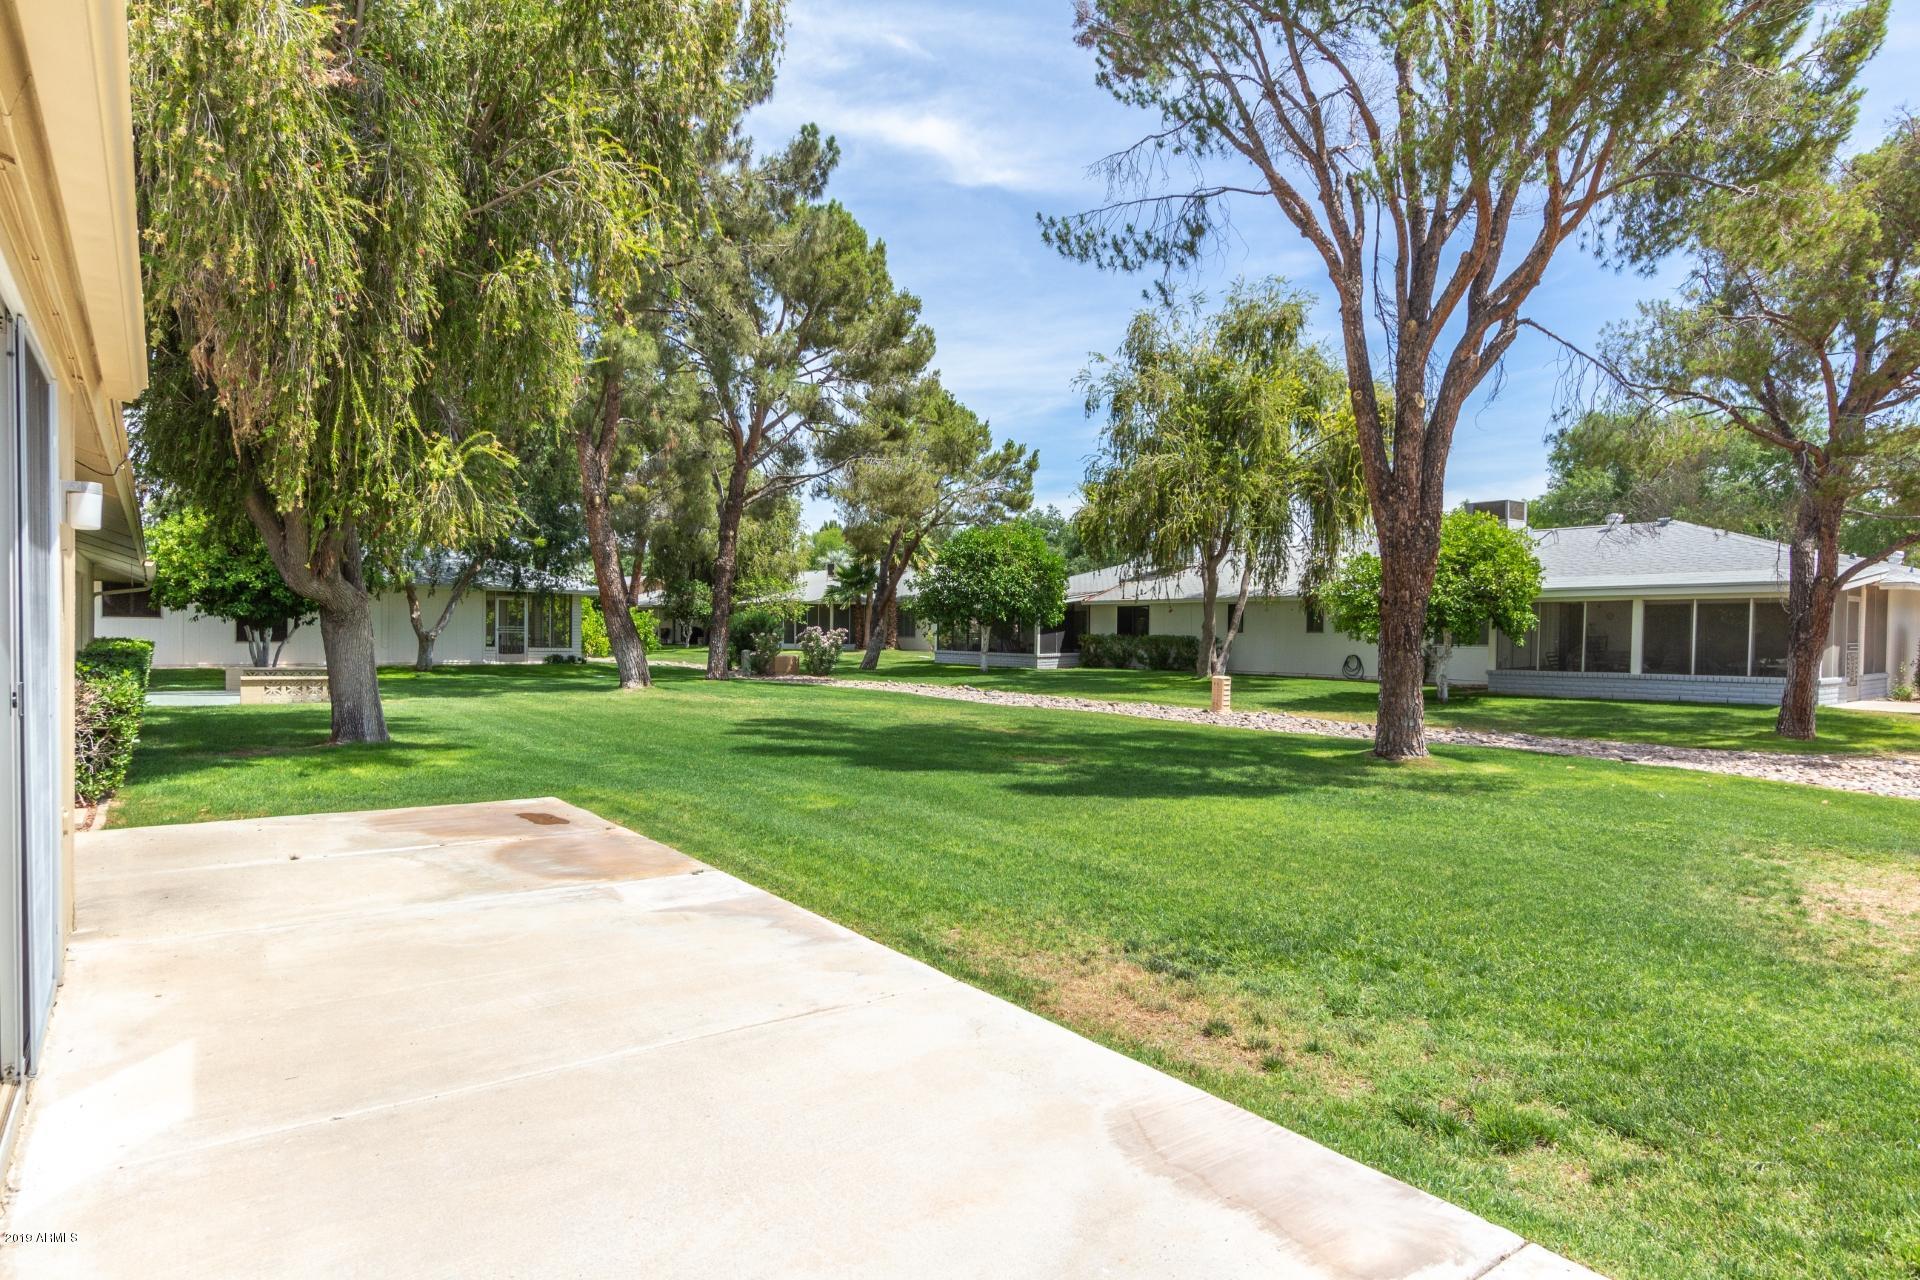 MLS 5926763 12714 W MAPLEWOOD Drive, Sun City West, AZ 85375 Sun City West AZ Condo or Townhome